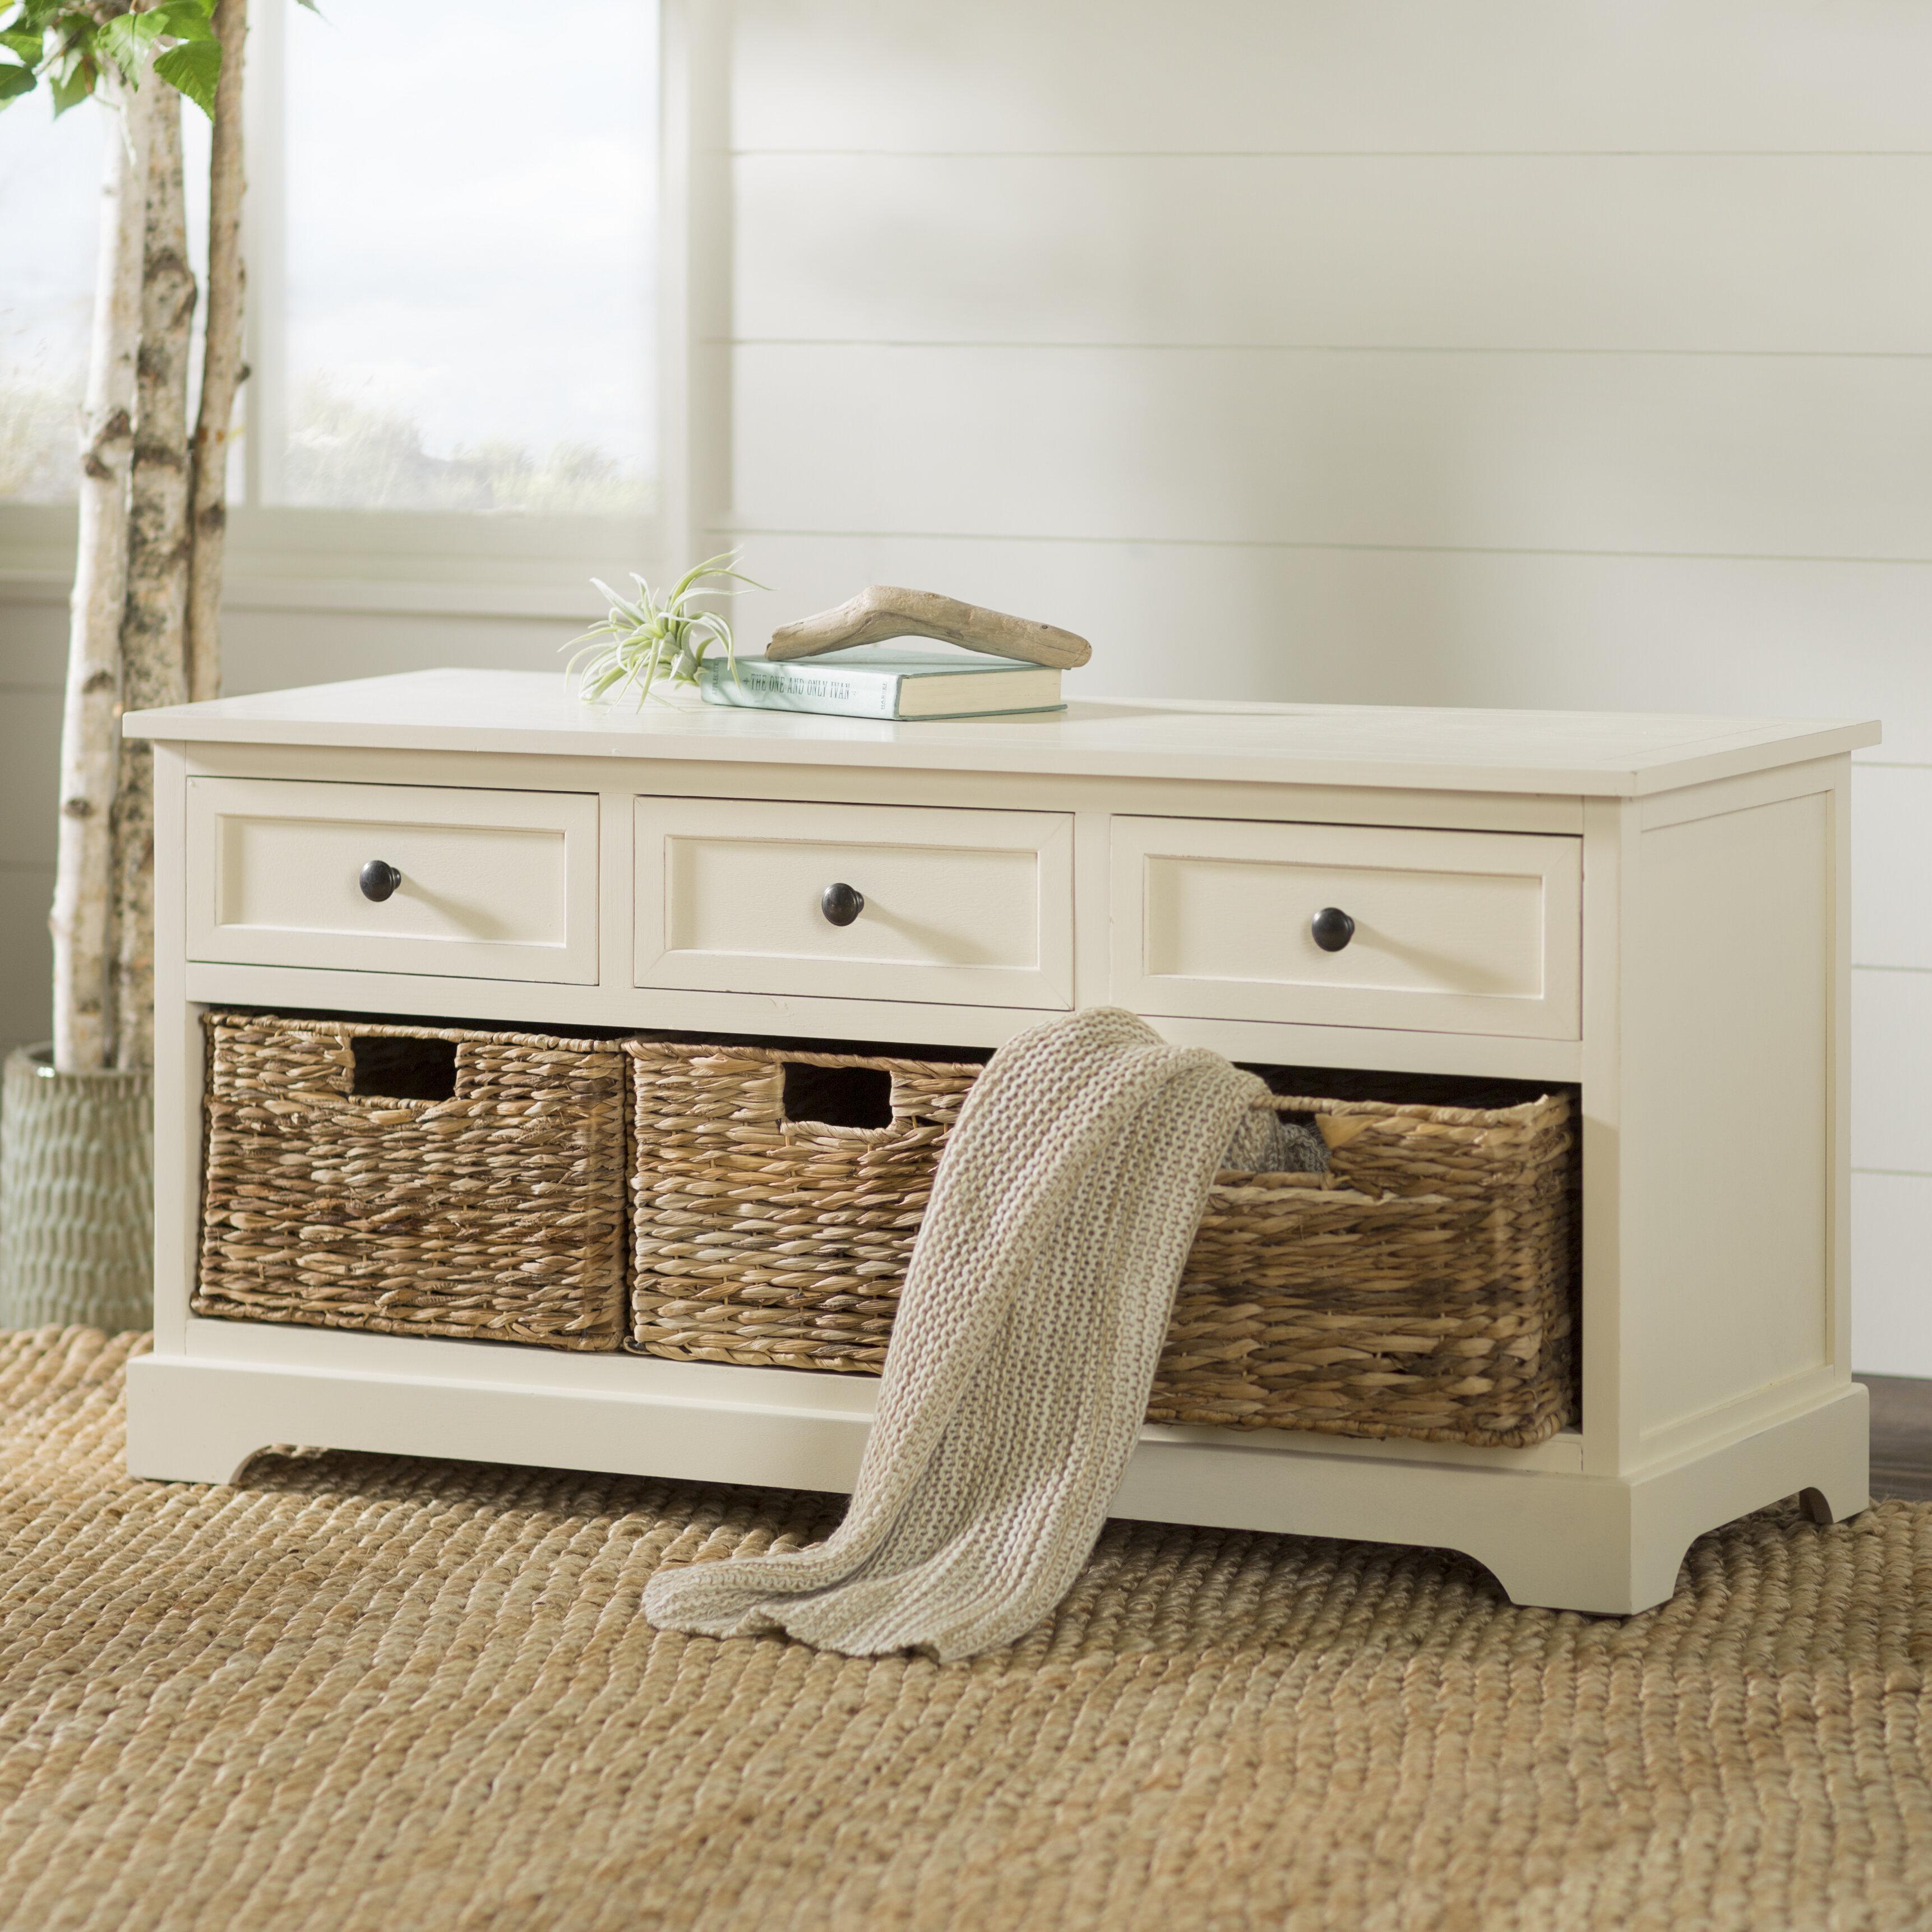 Beachcrest Home Ardina Drawers Storage Bench Reviews Wayfair